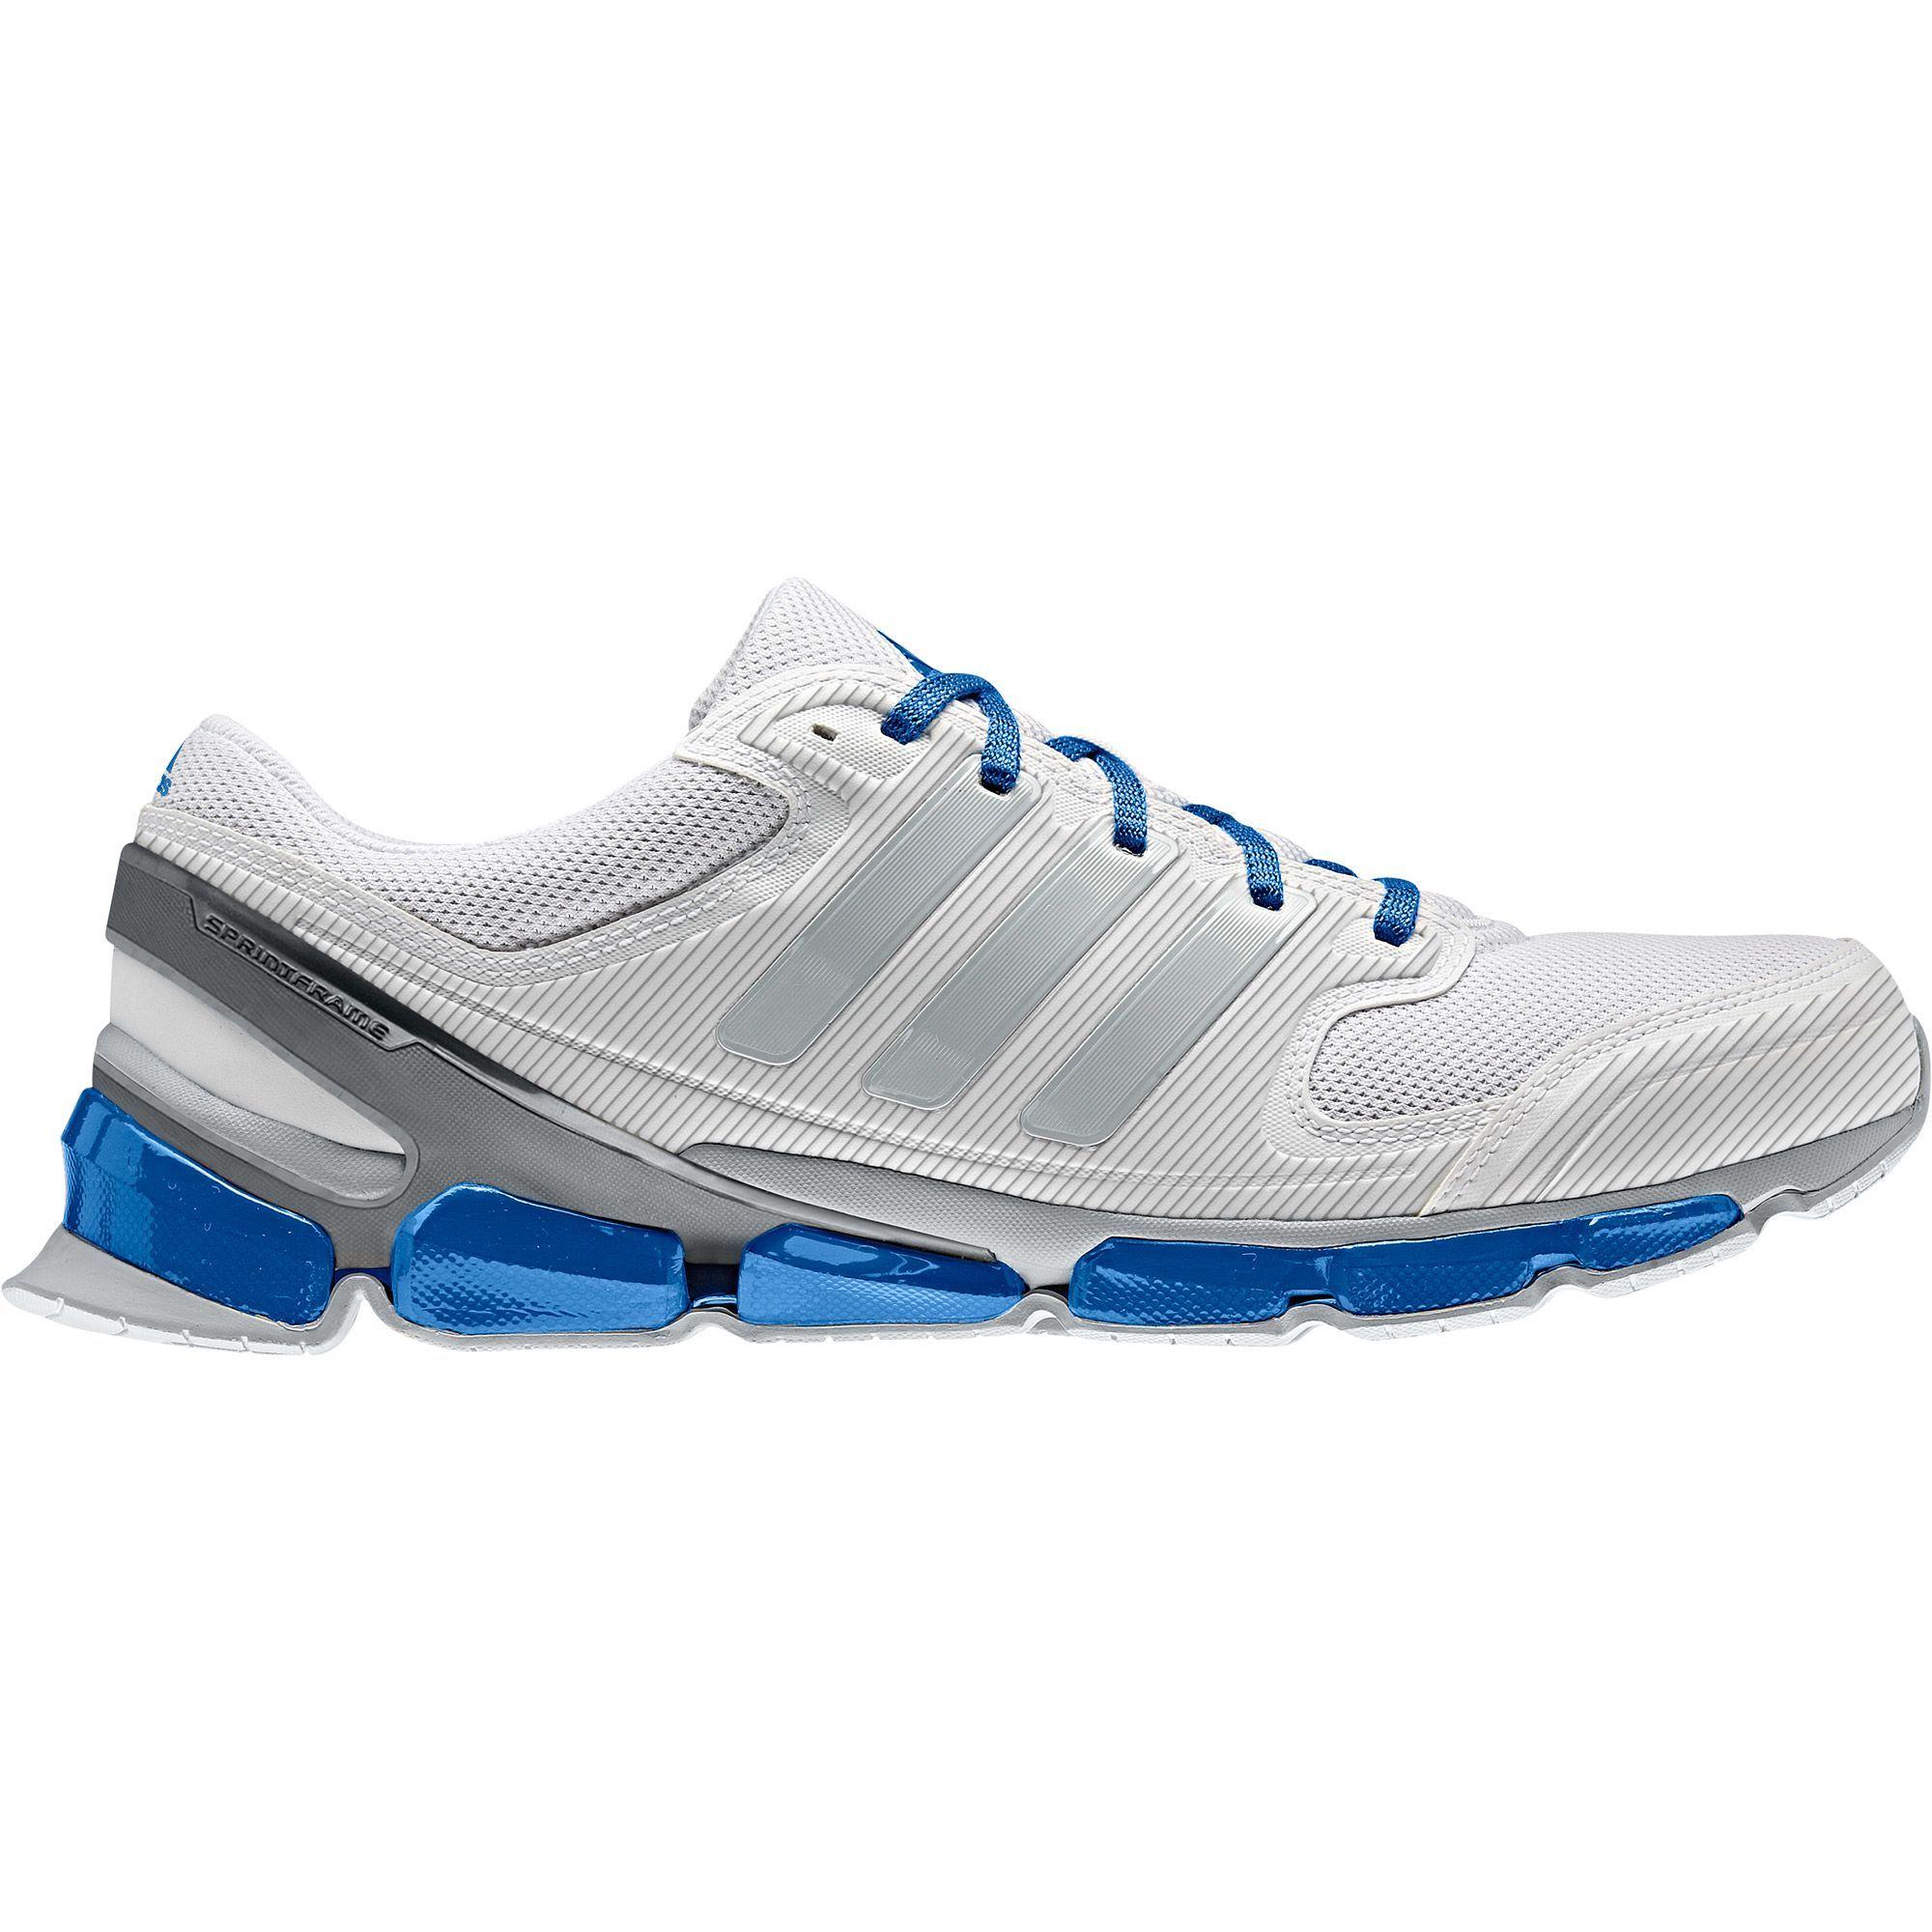 adidas Zapatillas de Running Dynamic fusion100 Hombre